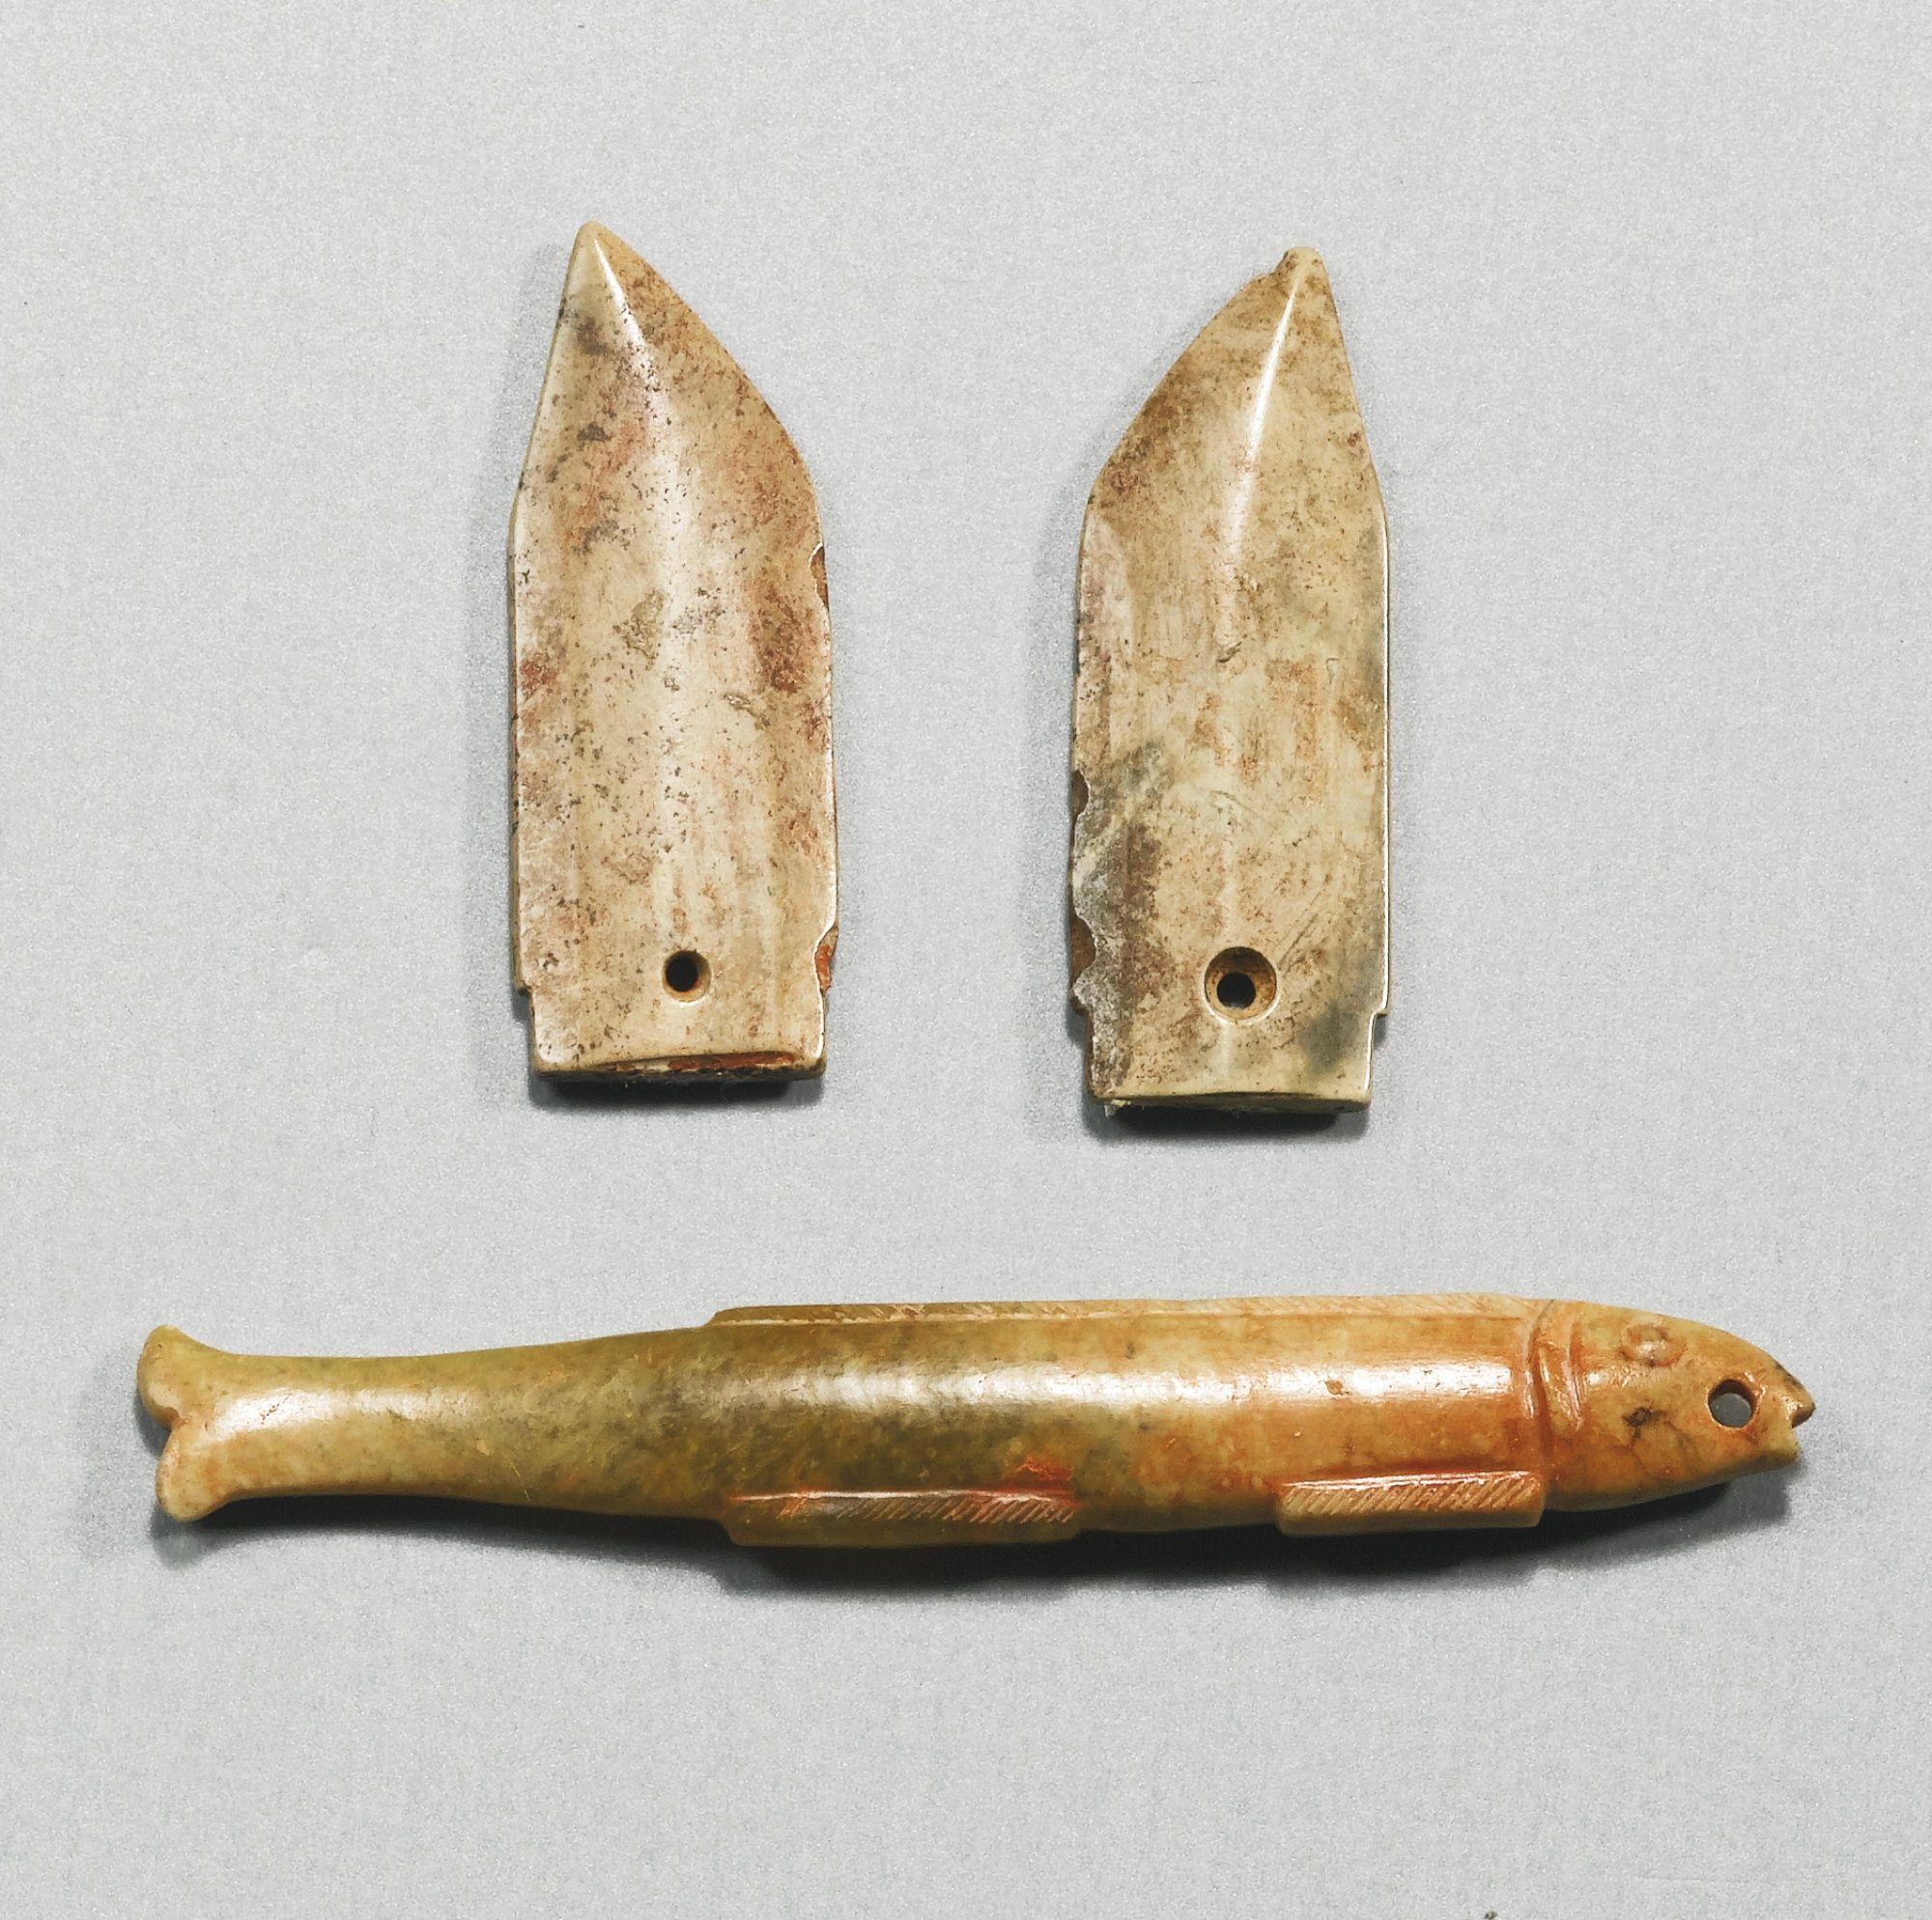 Three jade pendants shang to western zhou dynasty ca 11th century three jade pendants shang to western zhou dynasty ca 11th century 771 buycottarizona Choice Image